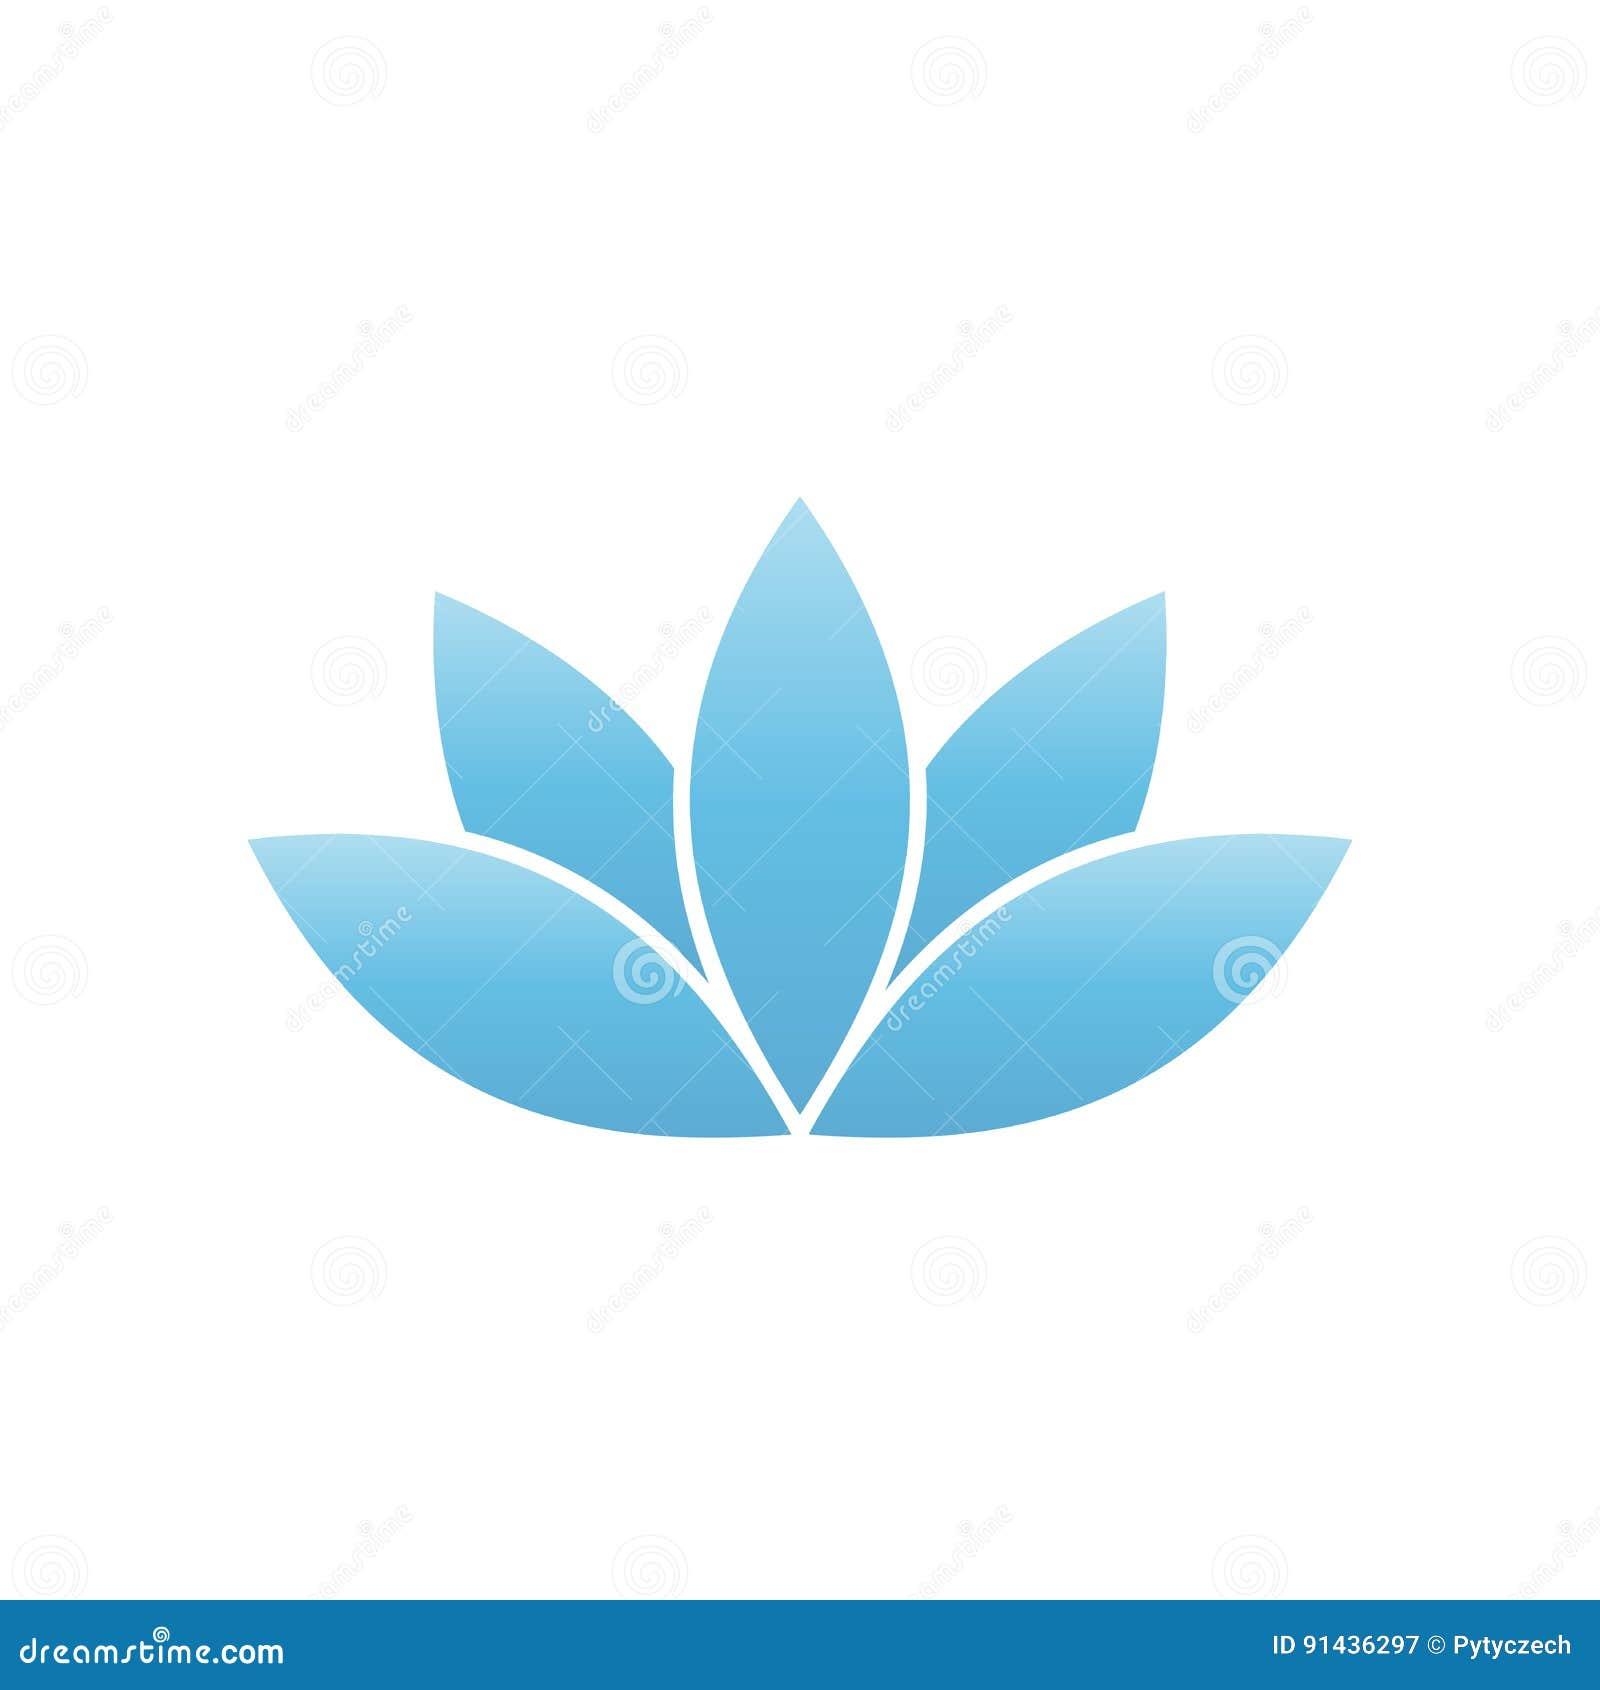 Blue lotus symbol. Spa and wellness theme design element. Vector illustration